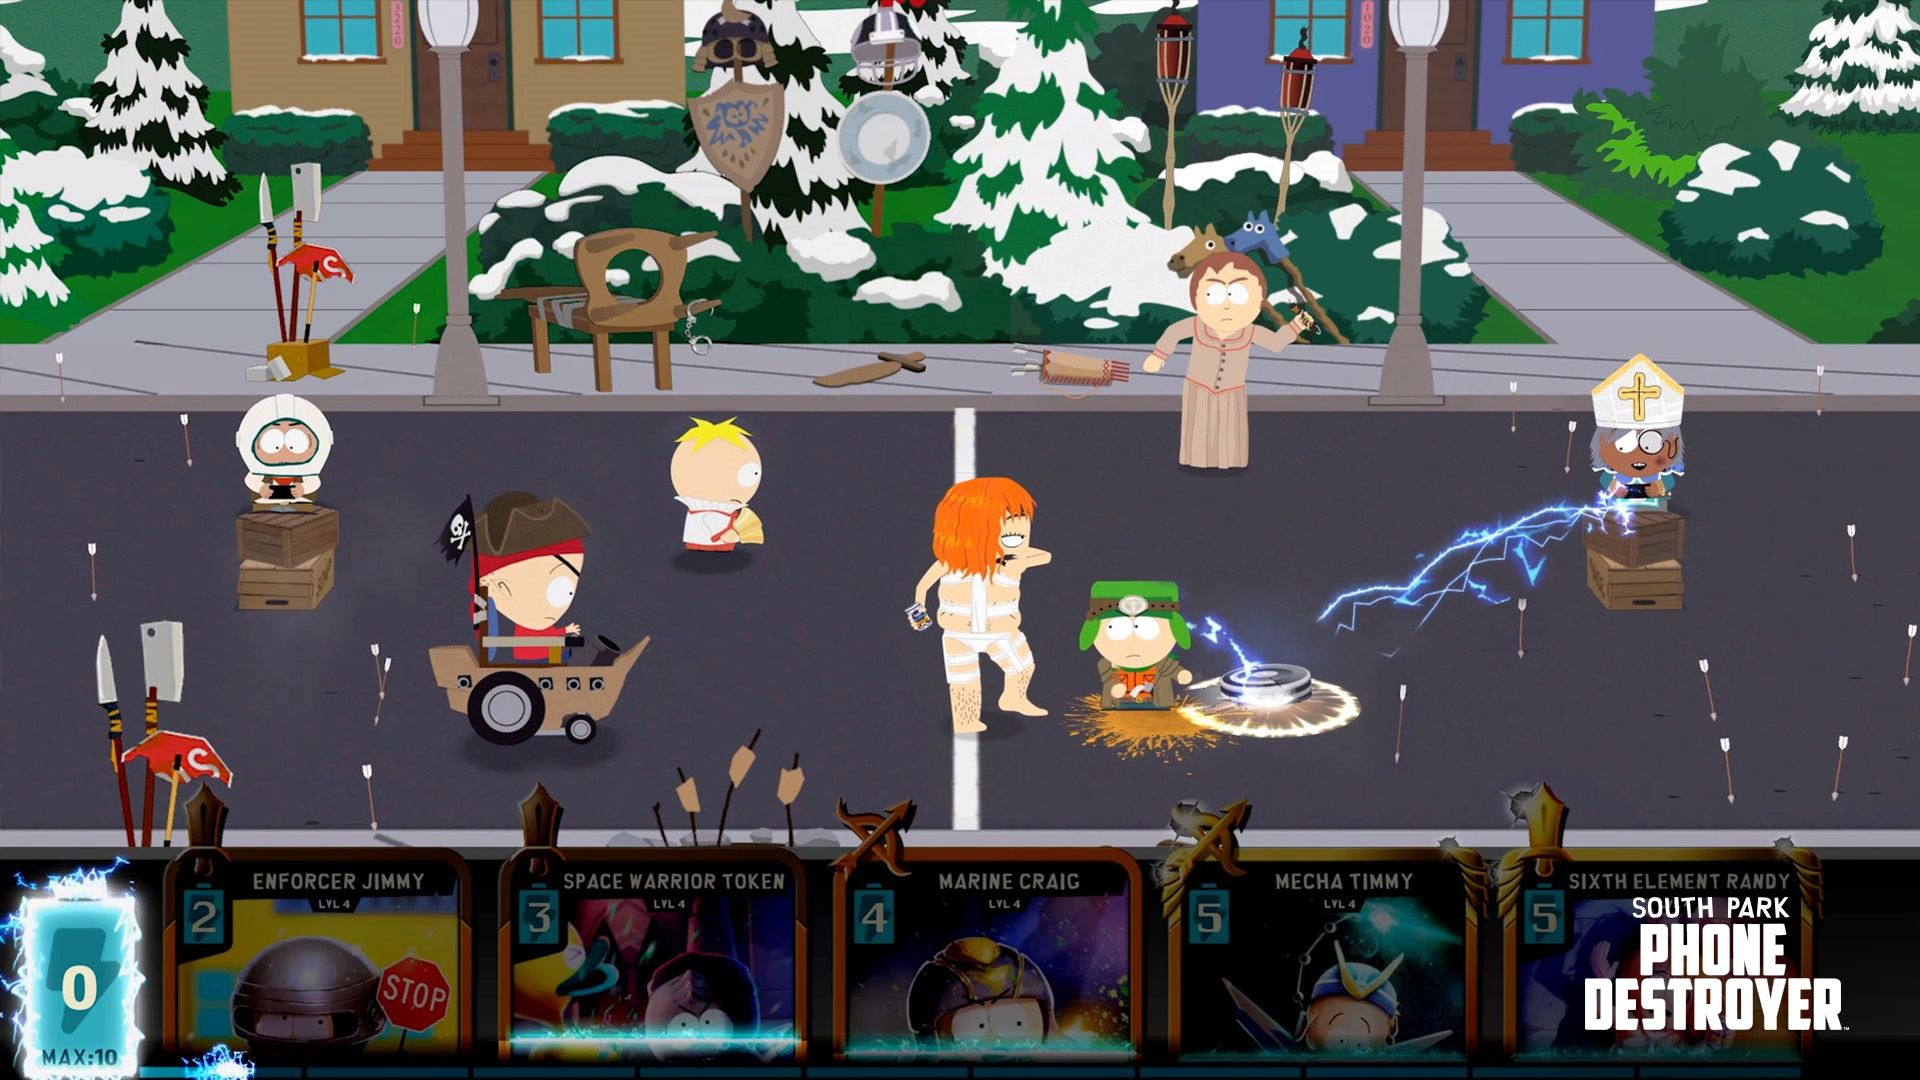 South Park: Phone Destroyer, кадр № 1